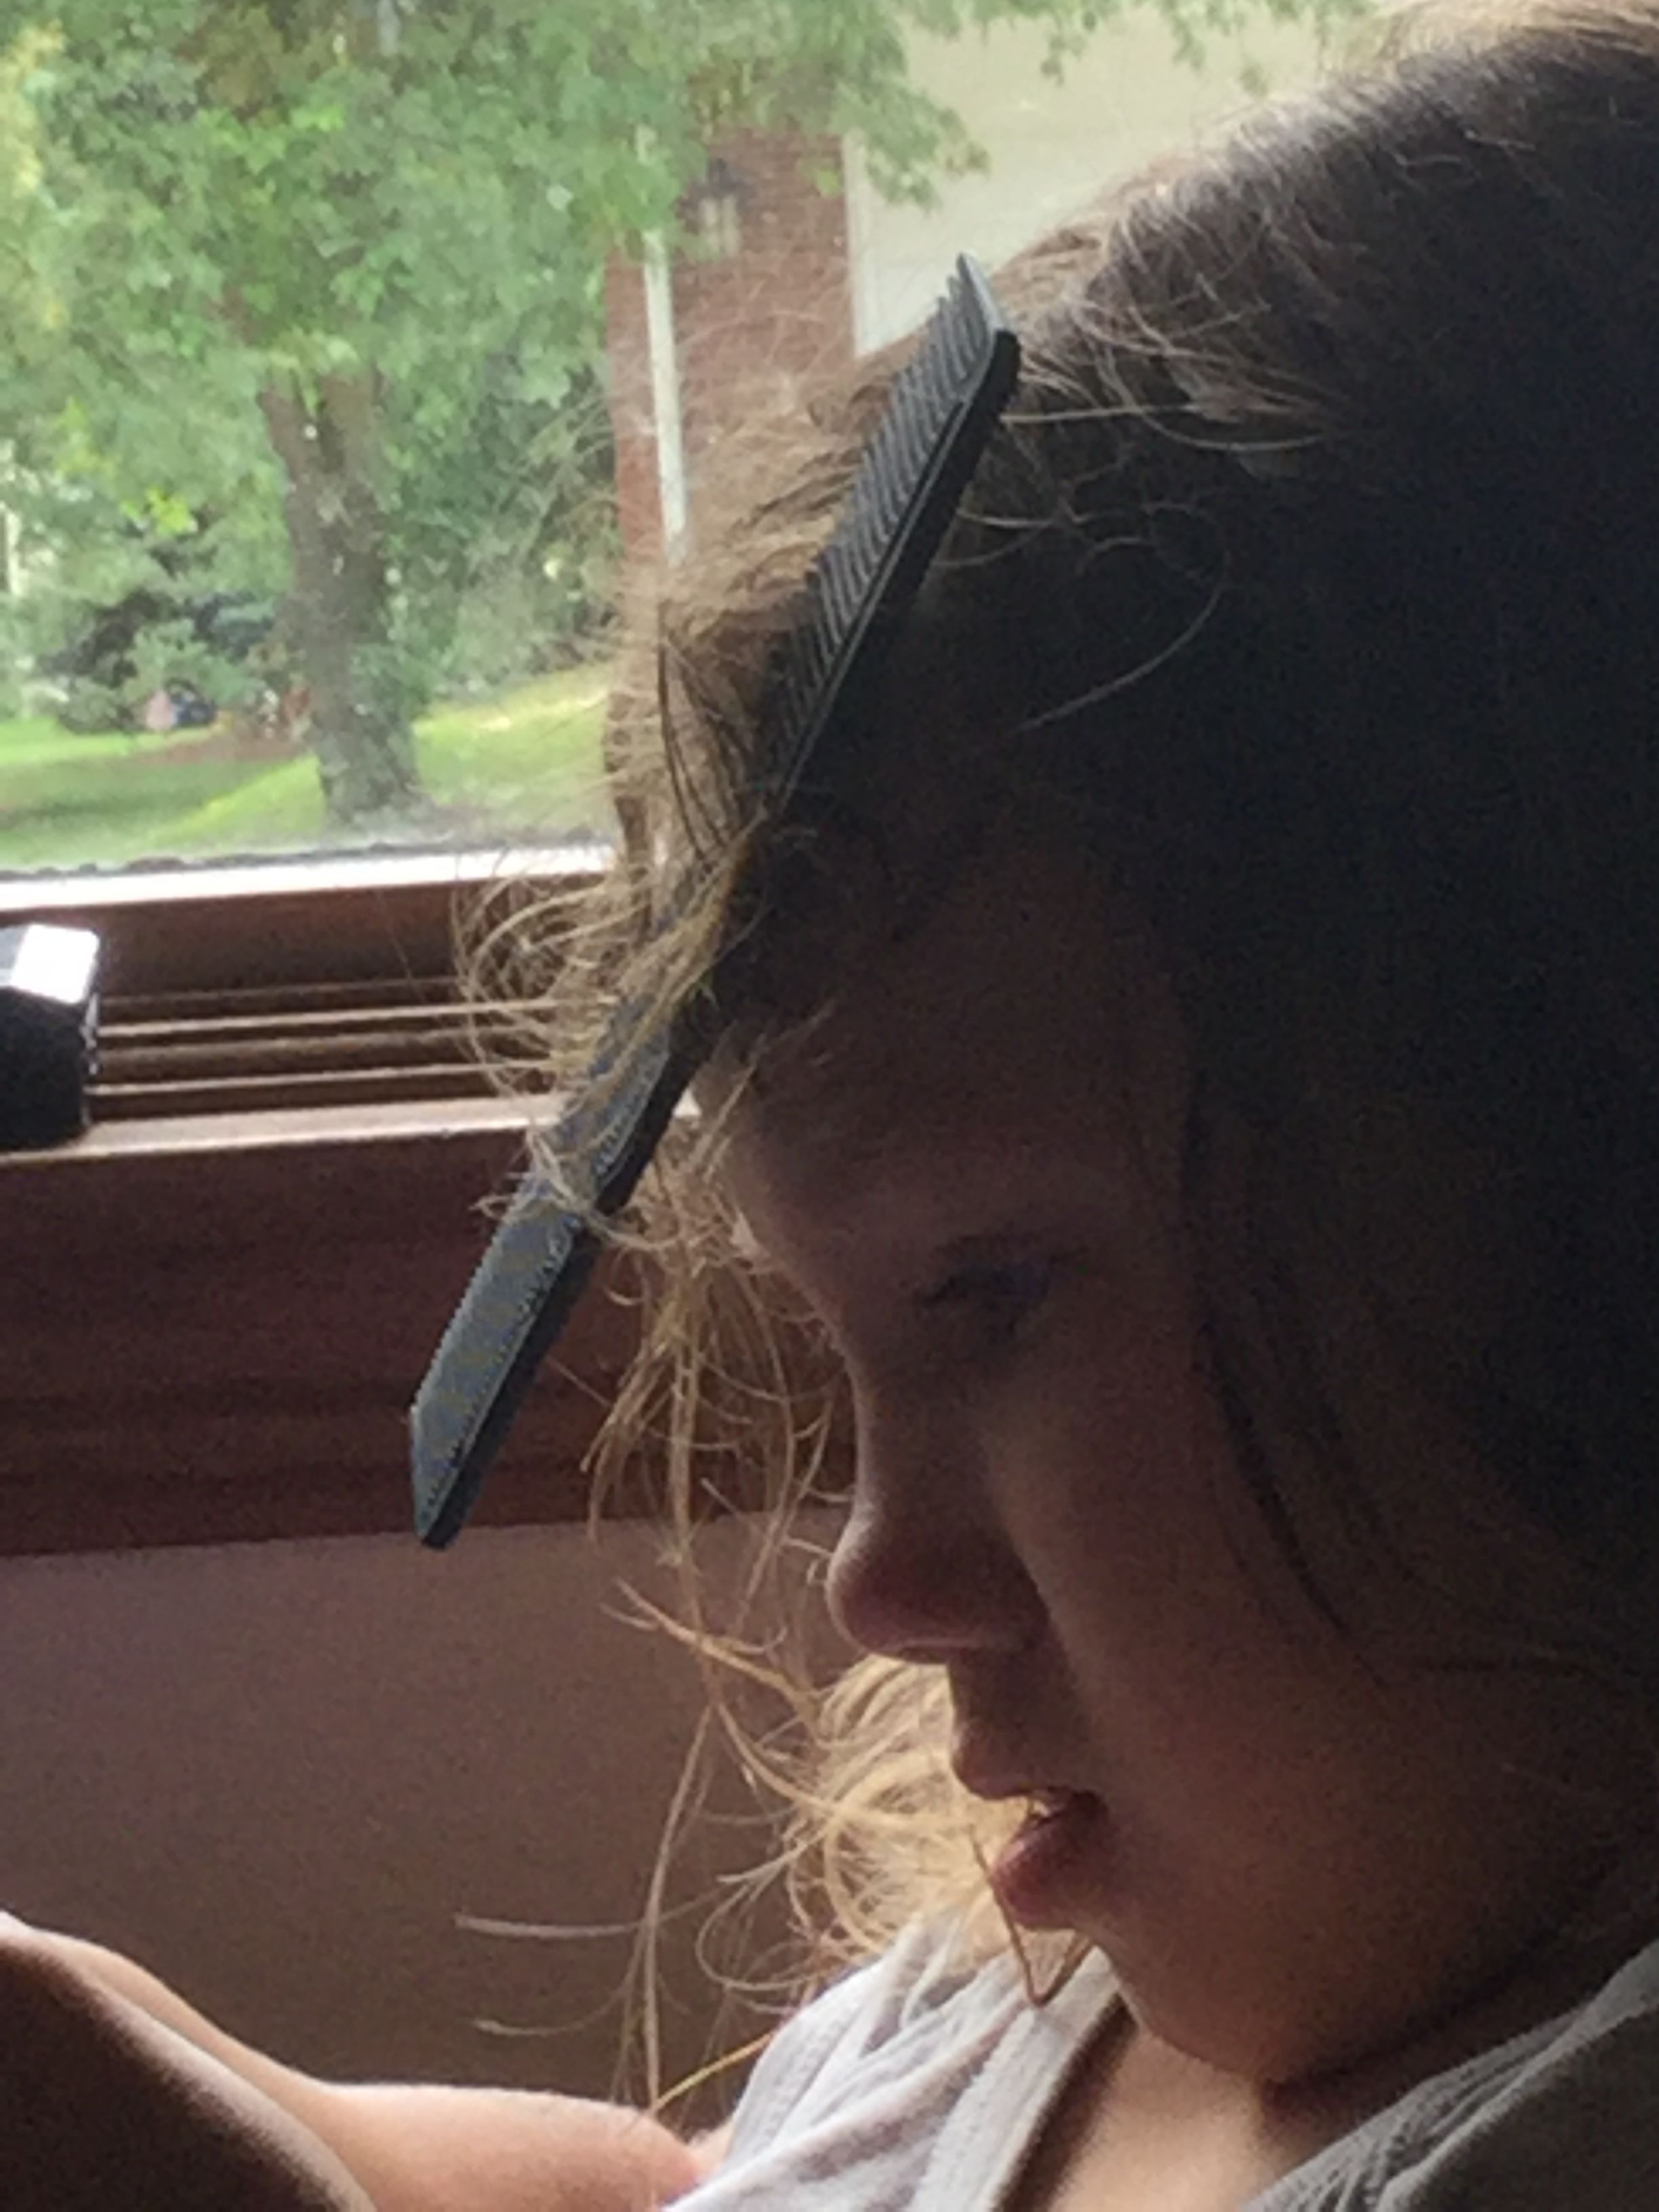 My step sister got a comb stuck in her hair | Hair sticks